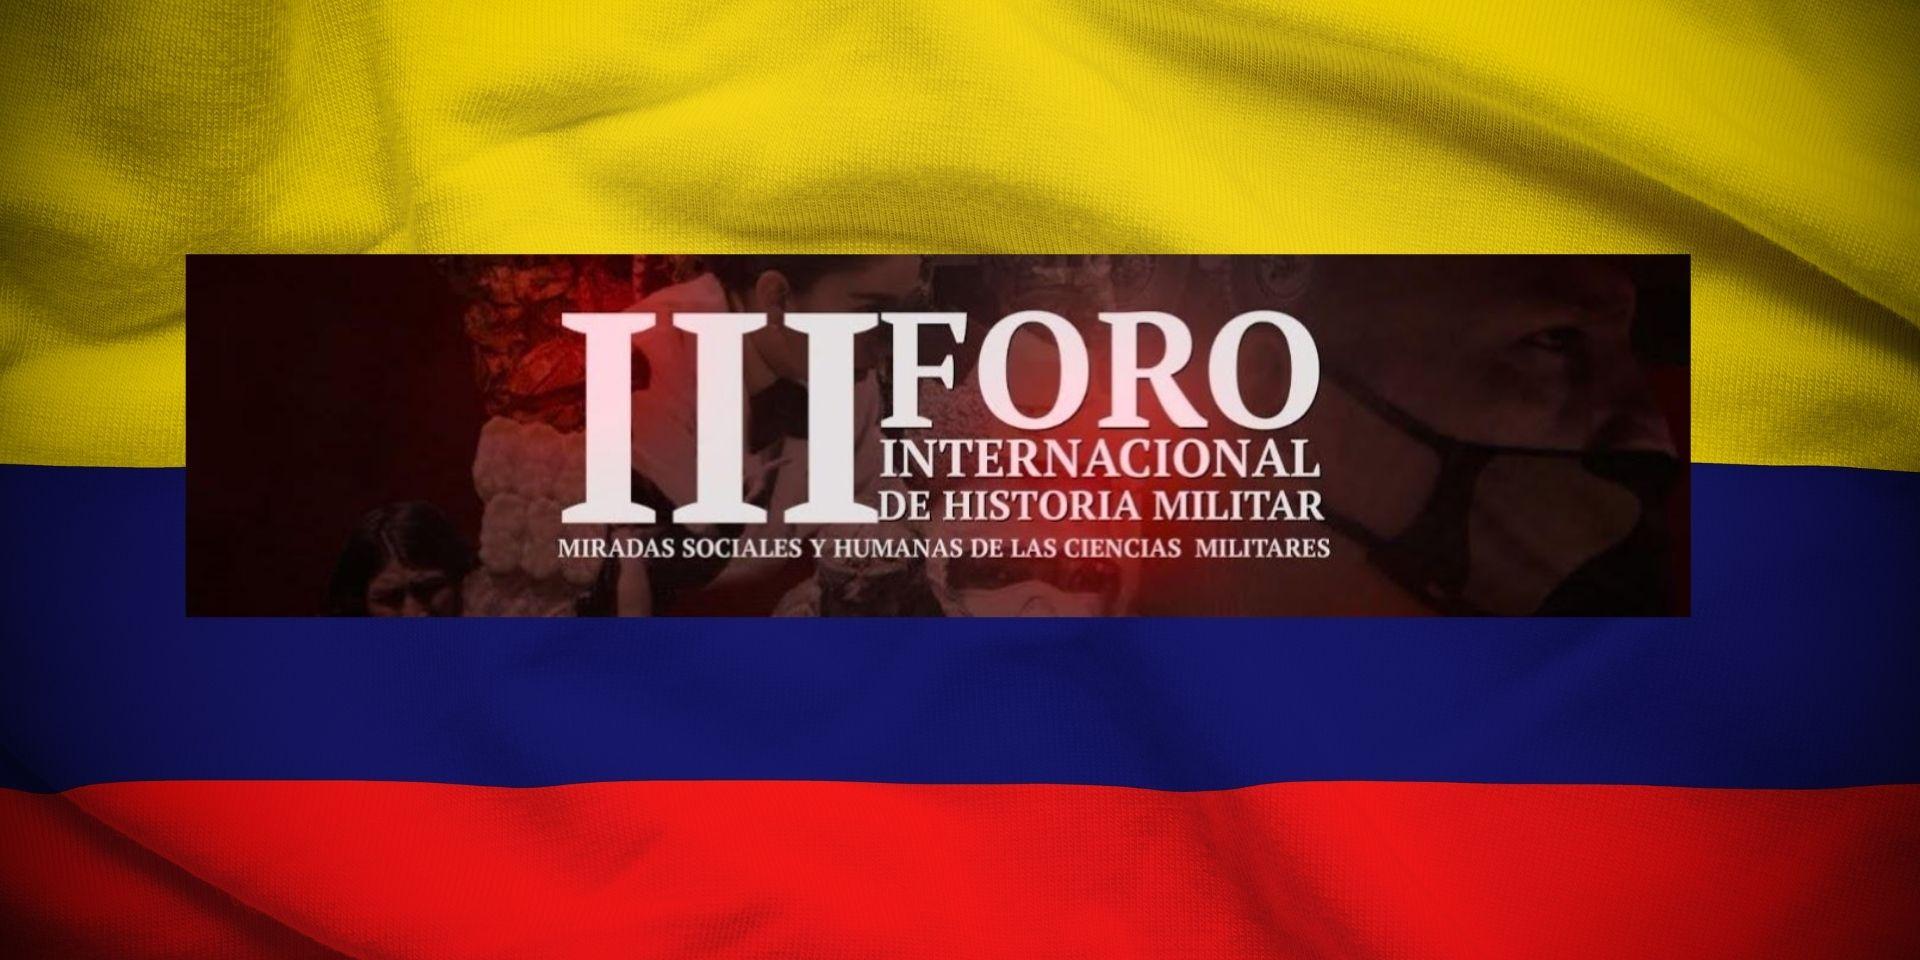 INISEG en el III Foro Internacional de Historia Militar 2021 | Iniseg